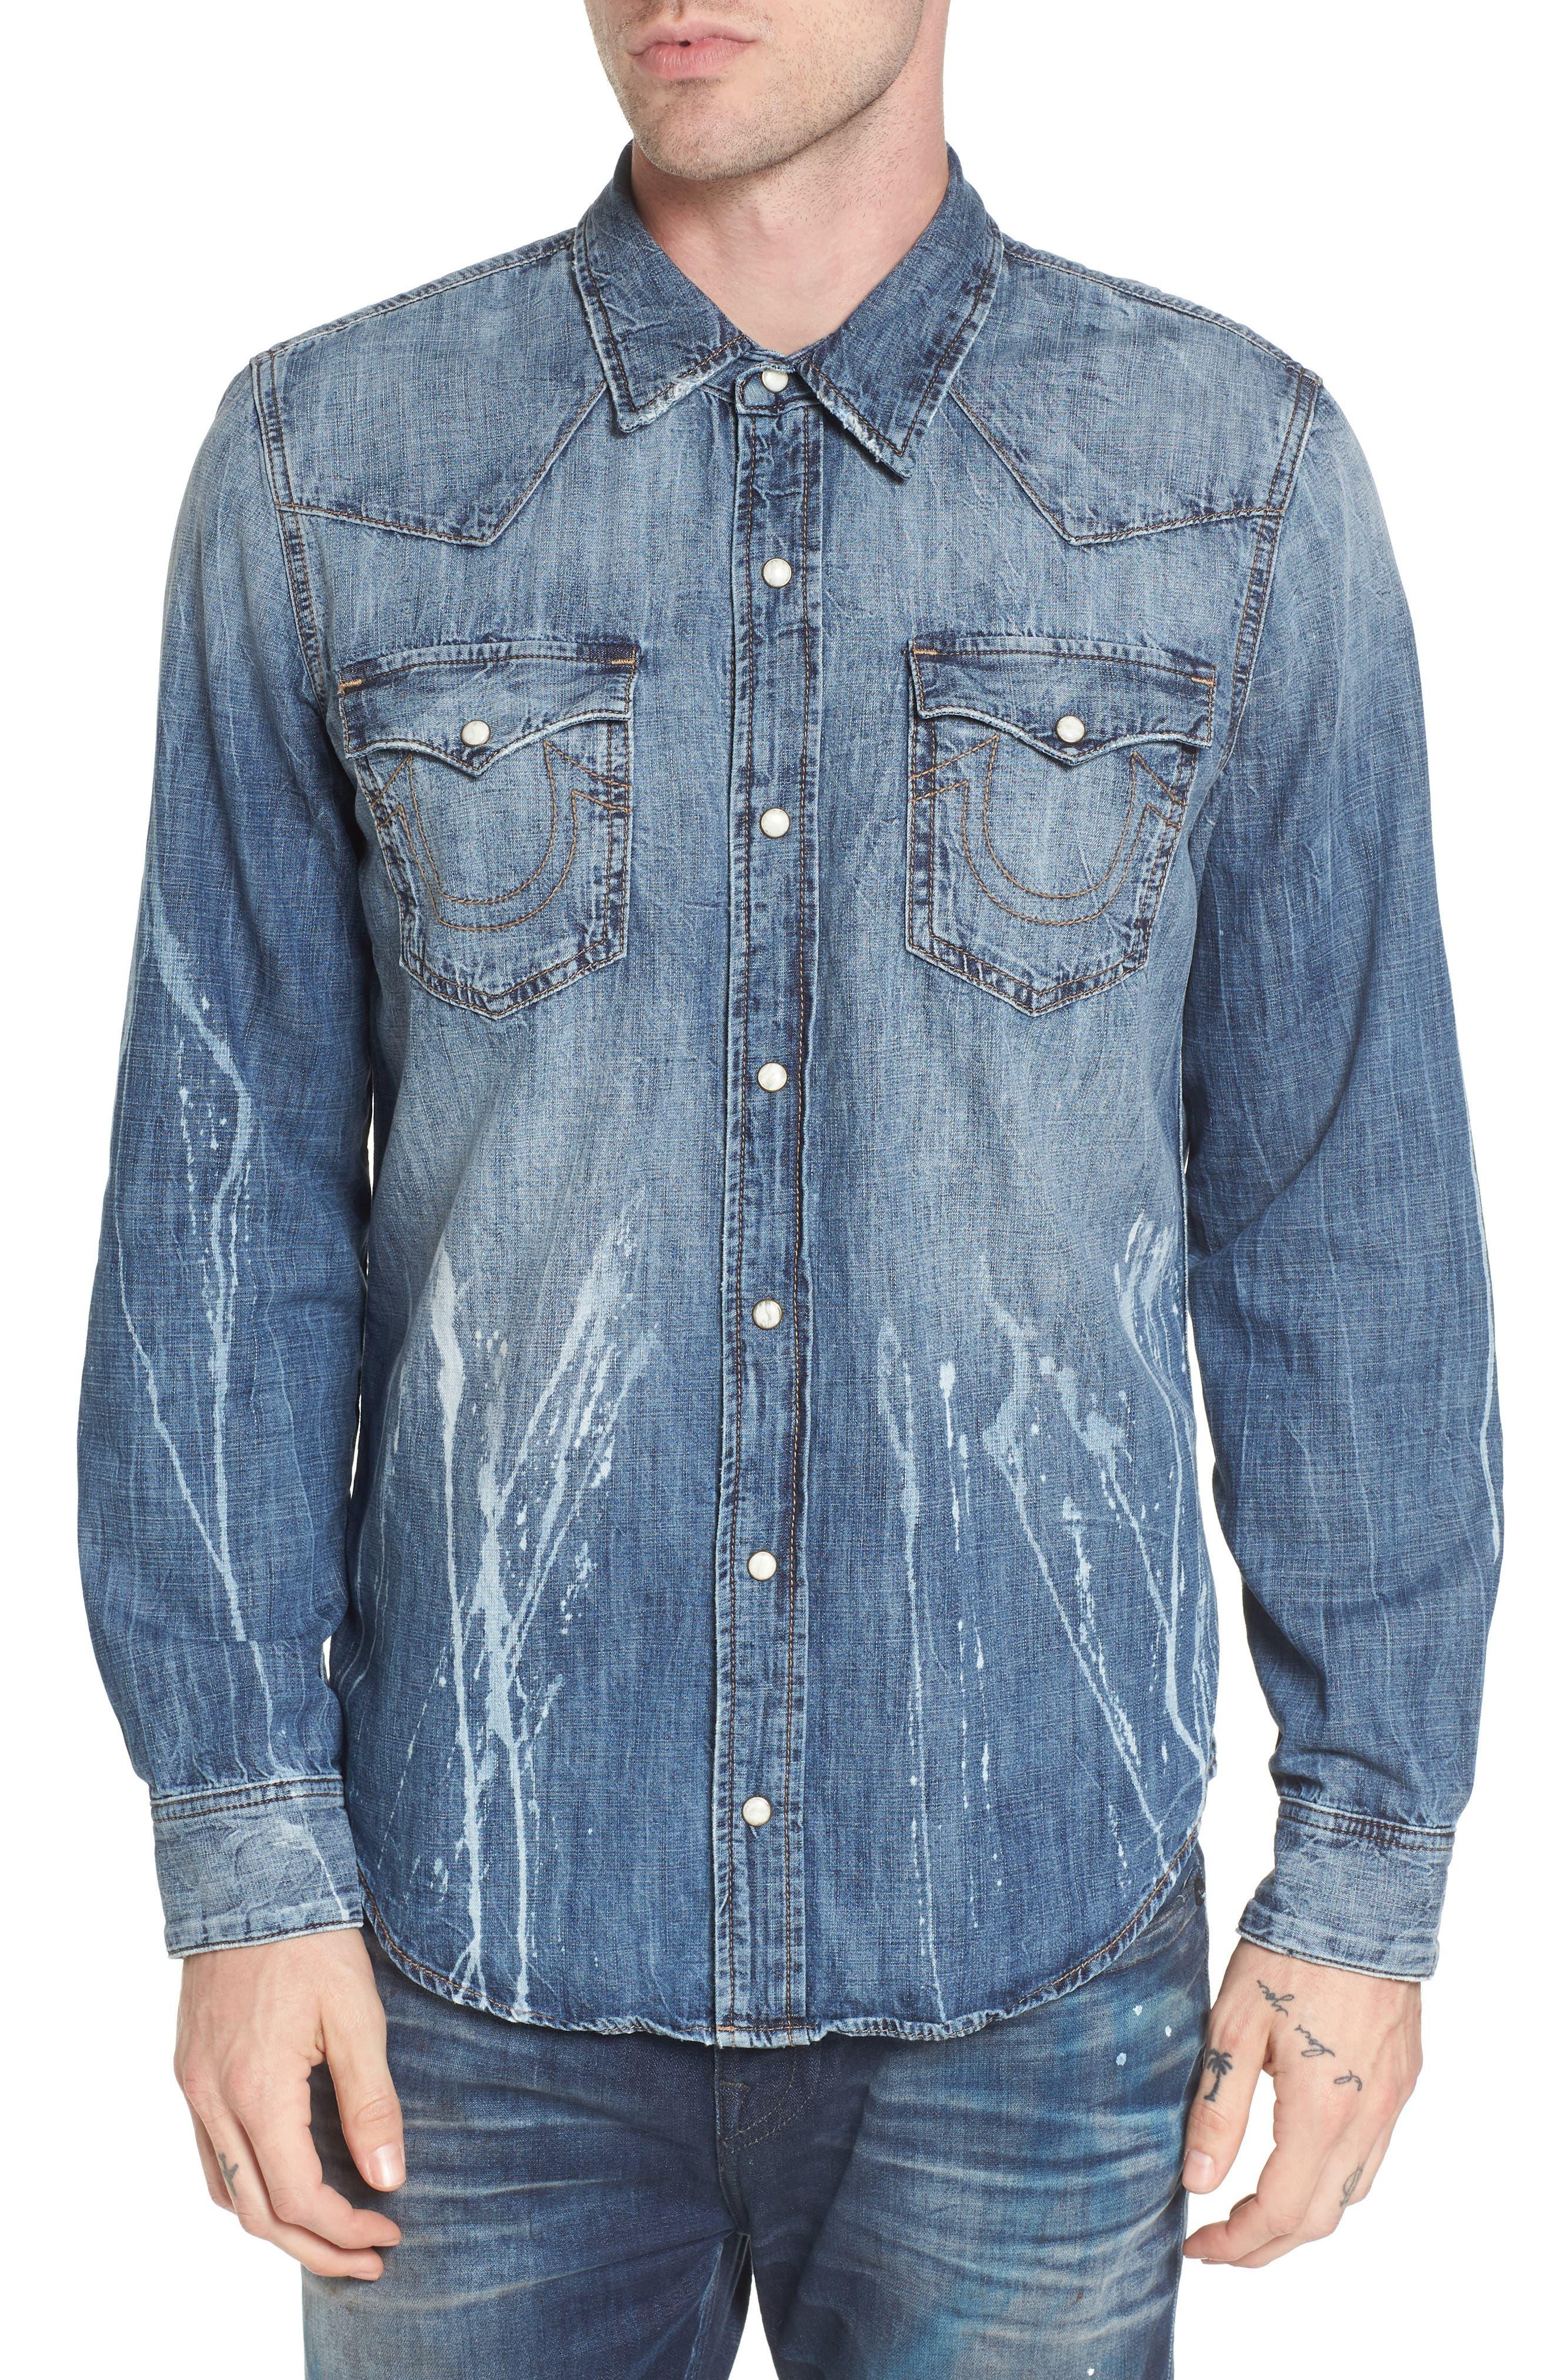 Main Image - True Religion Brand Jeans Ryan Runyon Rebel Long Sleeve Western Shirt